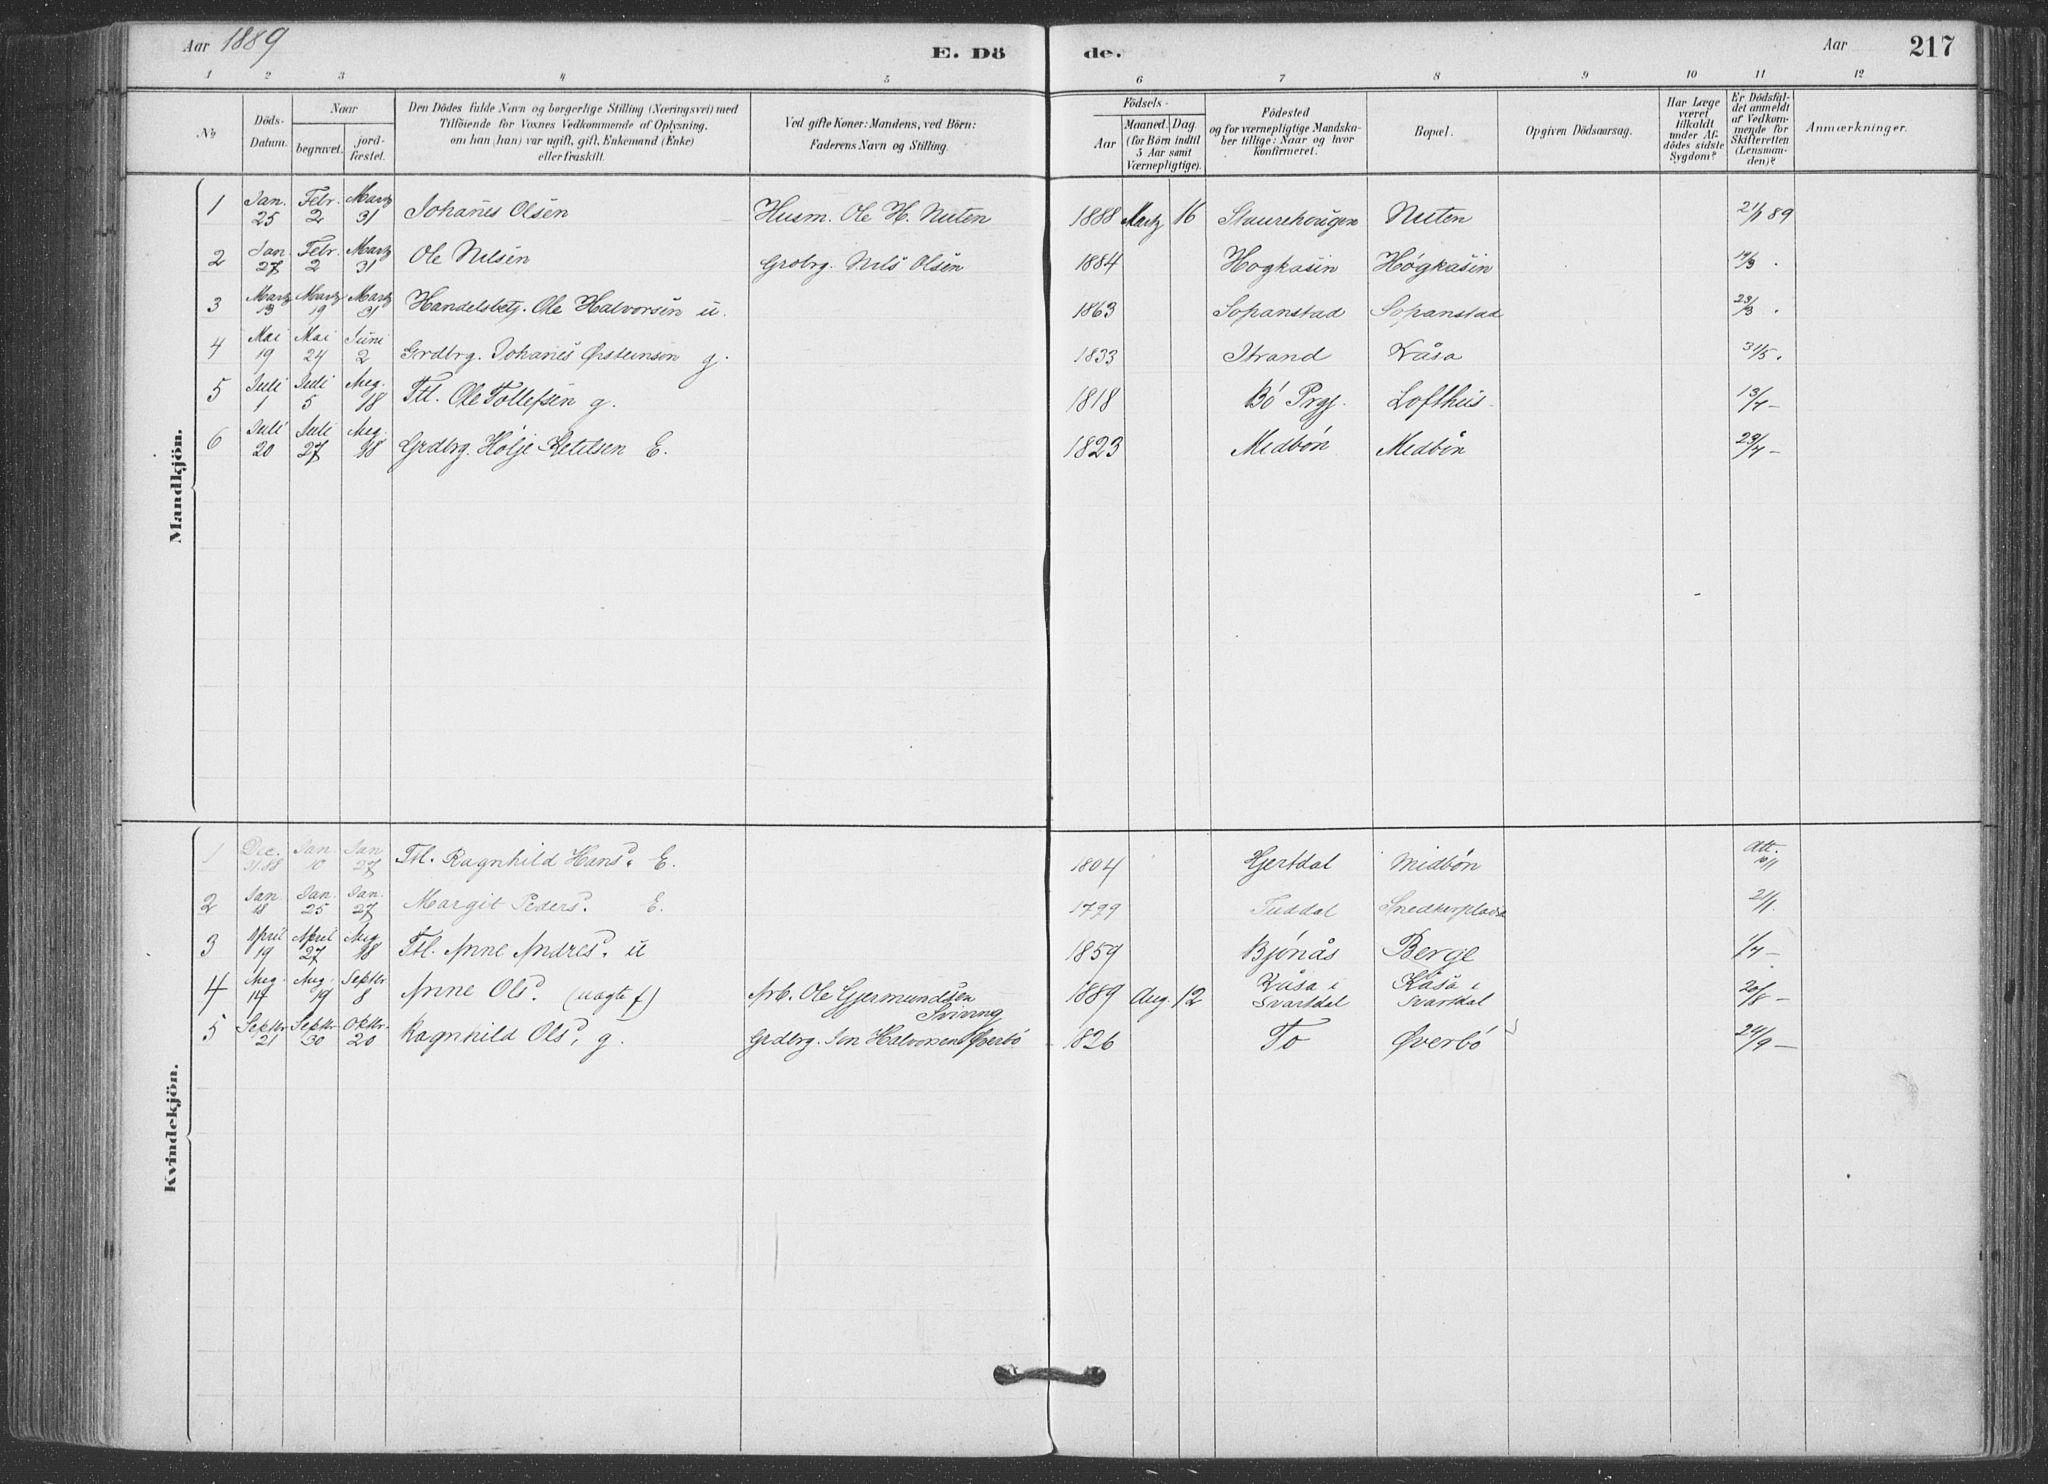 SAKO, Hjartdal kirkebøker, F/Fa/L0010: Ministerialbok nr. I 10, 1880-1929, s. 217